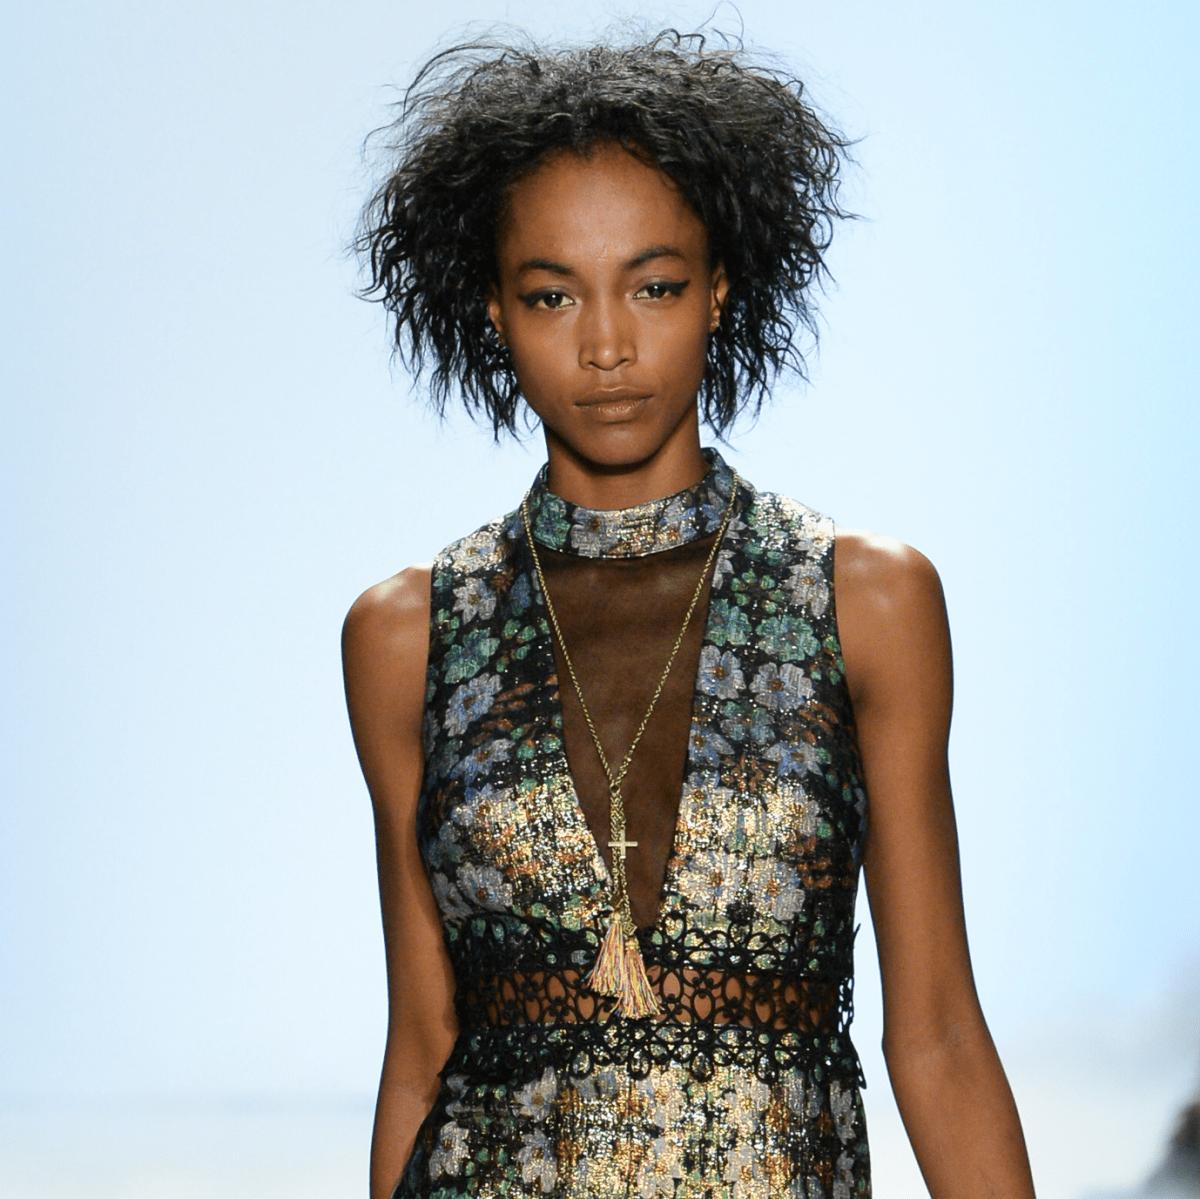 Nicole Miller fall 2016 runway show